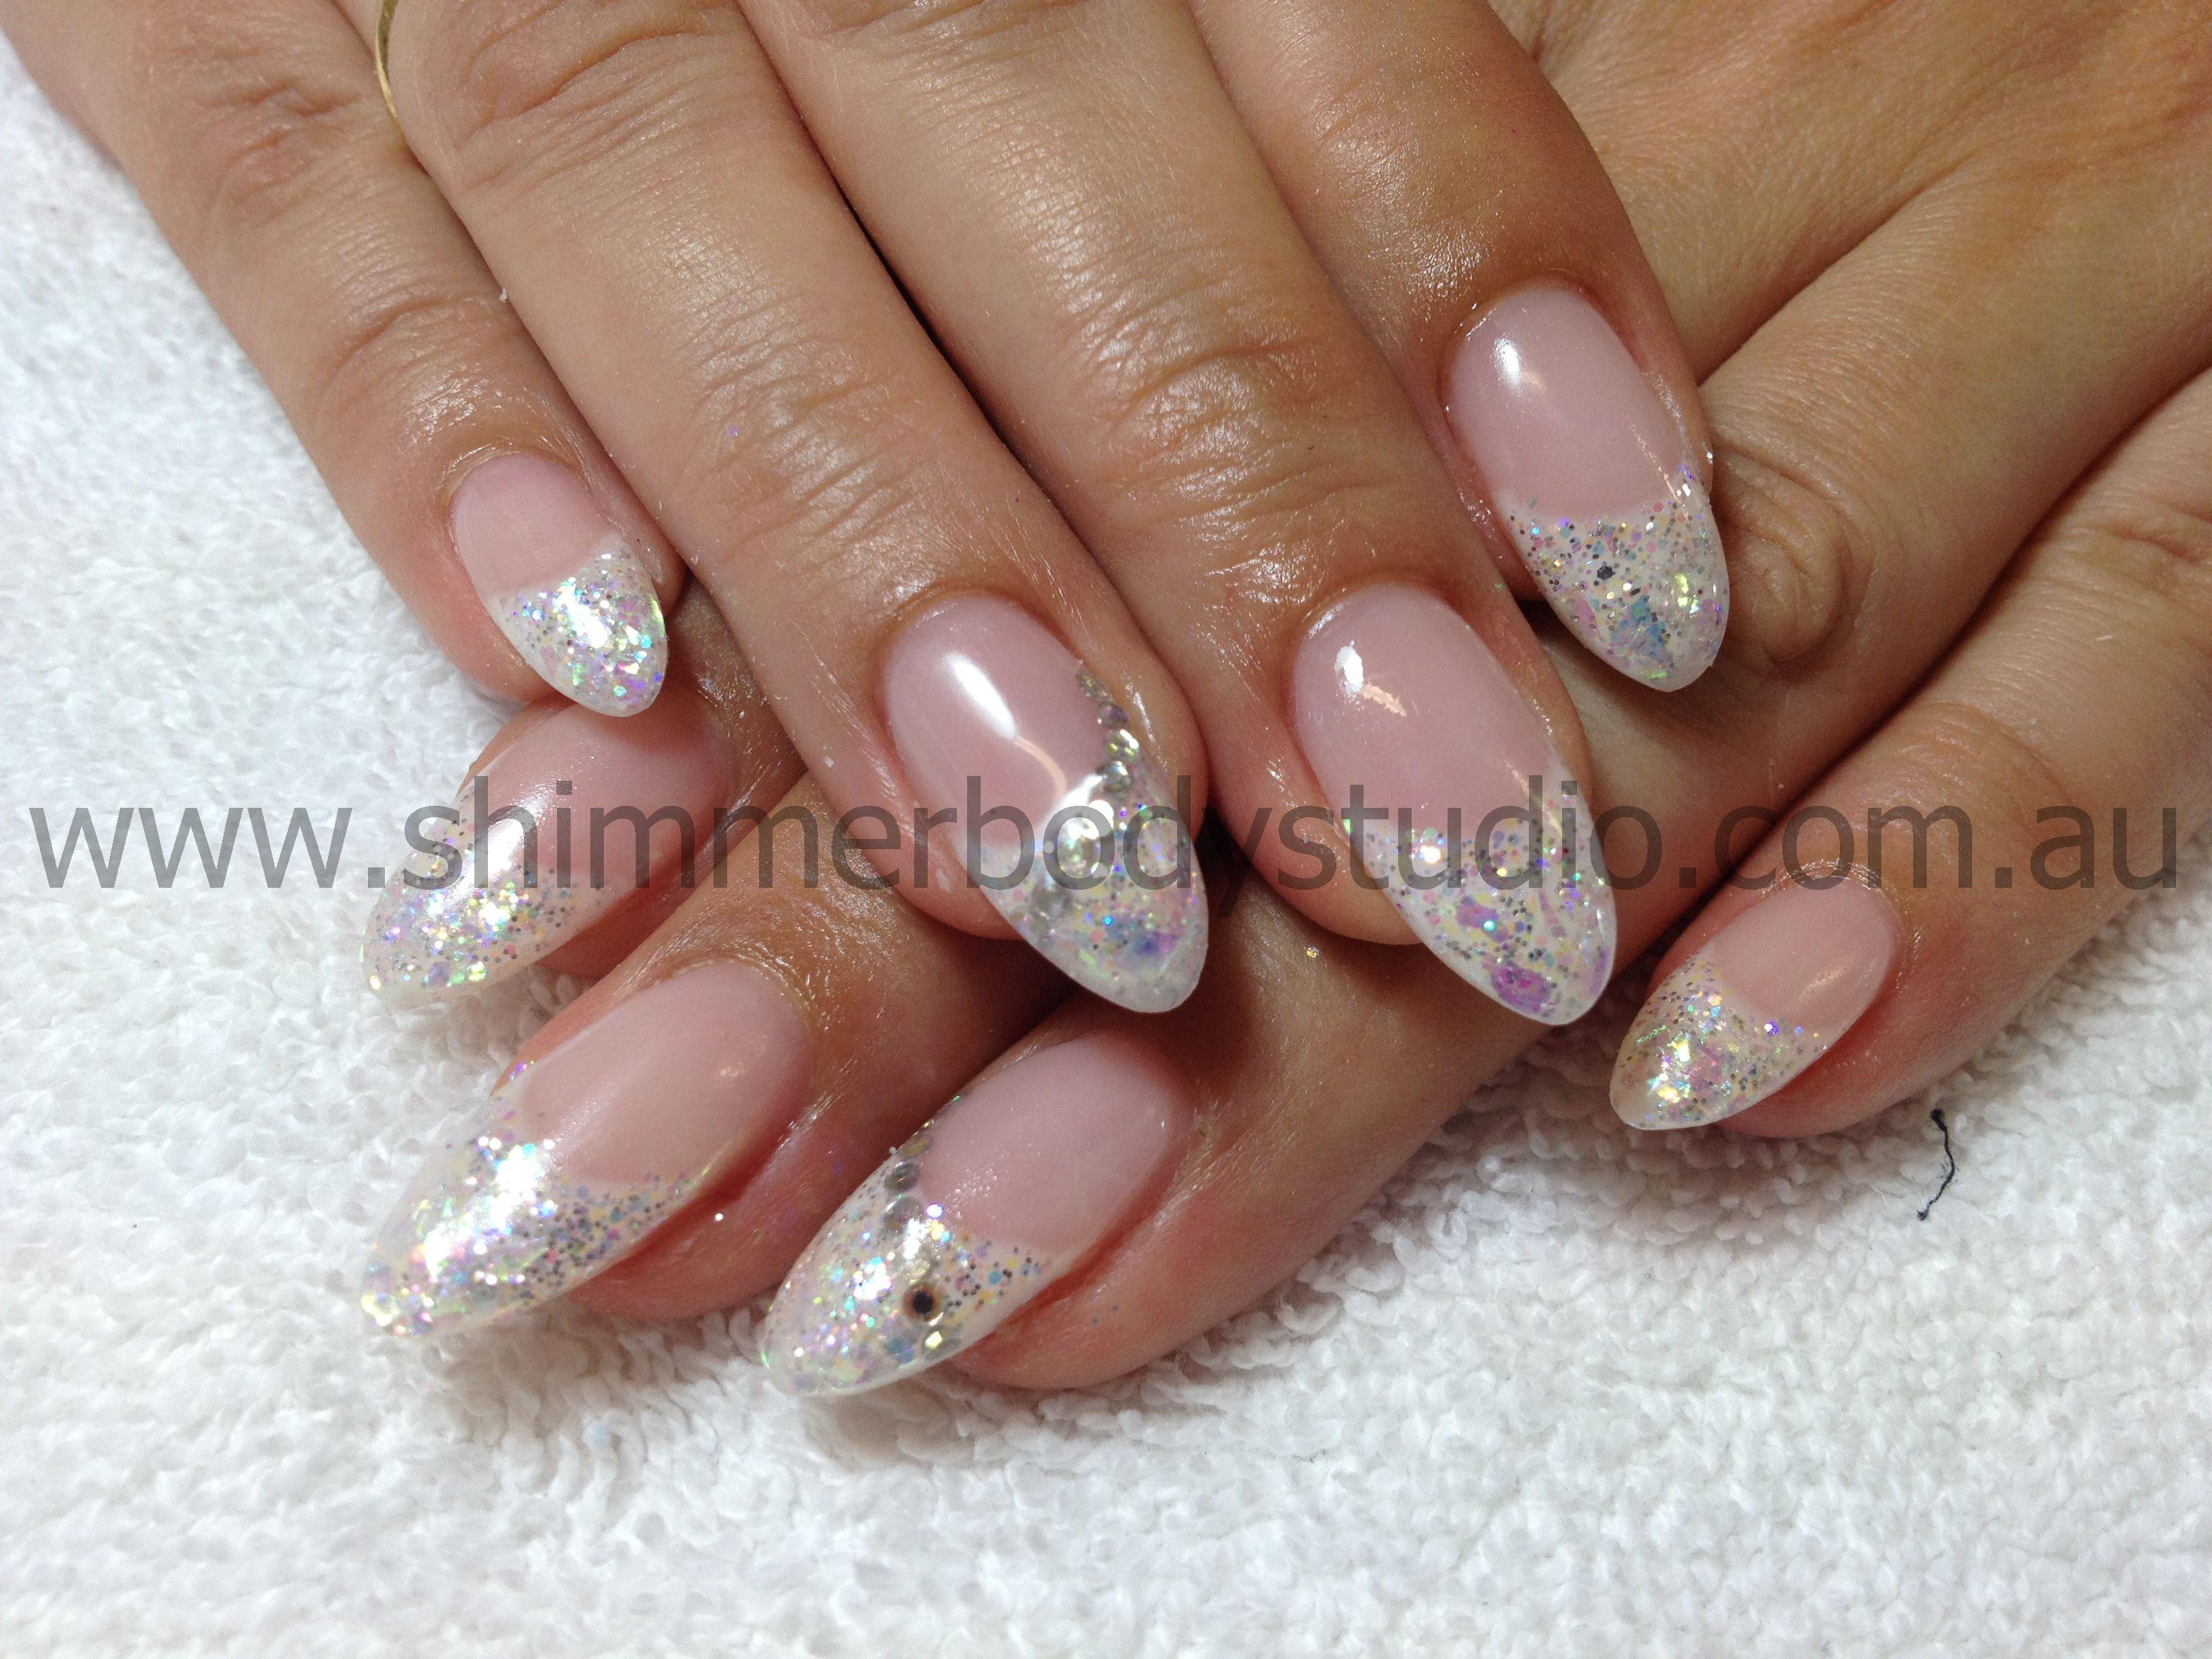 Gel Nails. French Nails. Glitter Nail Art. | Nails! | Pinterest ...